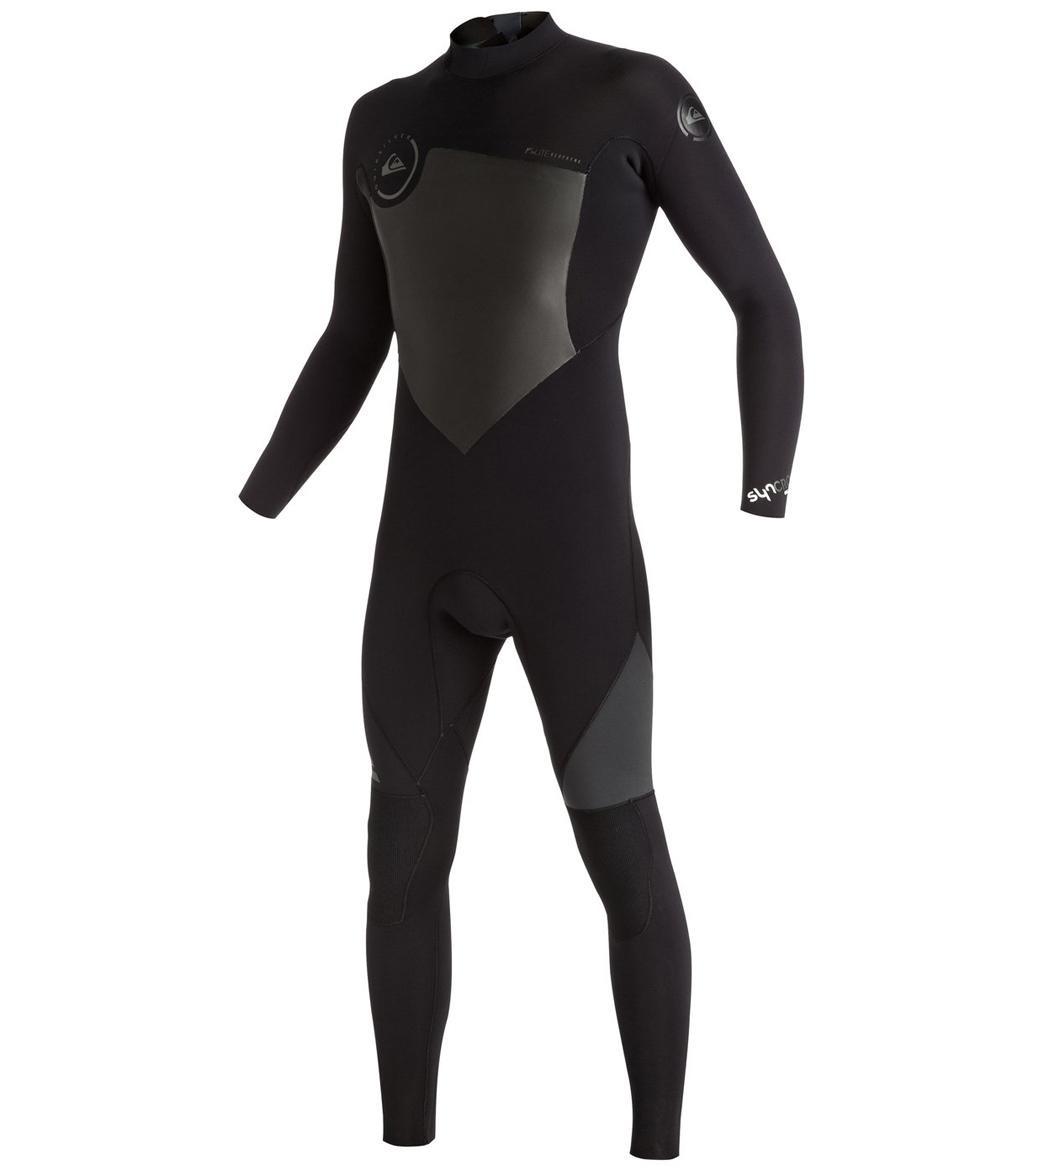 Quiksilver Men s 5 4 3mm Syncro Back Zip Fullsuit Wetsuit at ... aa745c8047a